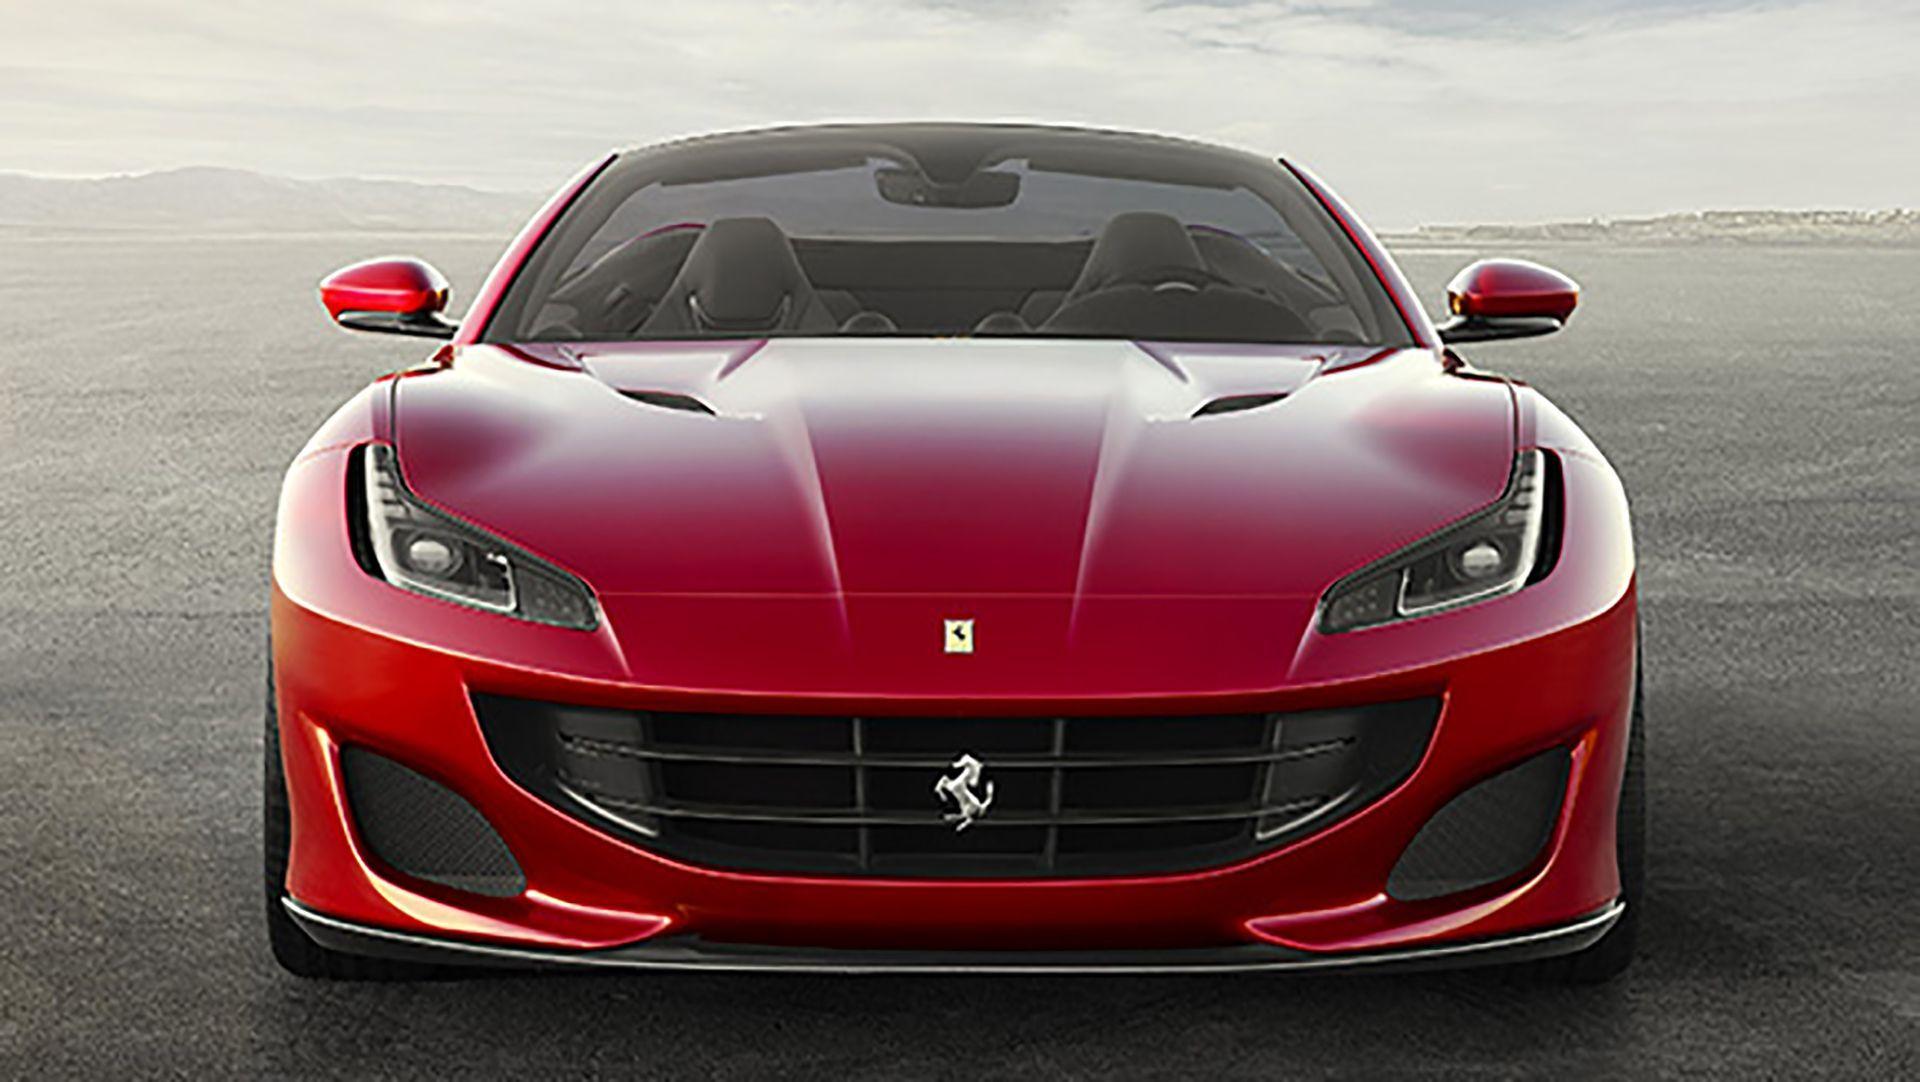 Meet The Ferrari Portofino The Most Affordable Ferrari Sports Car Yet Trusted Reviews феррари феррари калифорния роскошный автомобиль